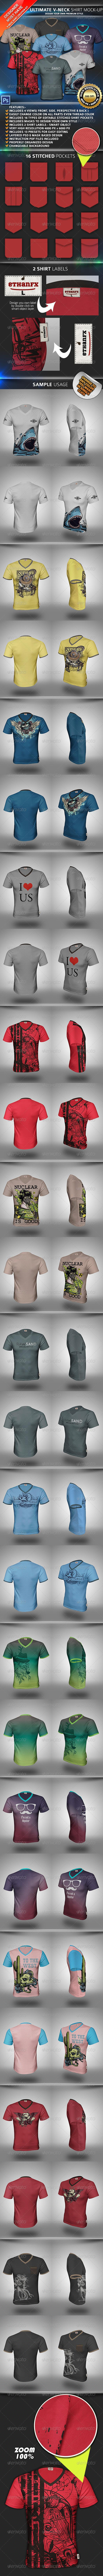 GraphicRiver V-Neck T-Shirt Mockup 7569853